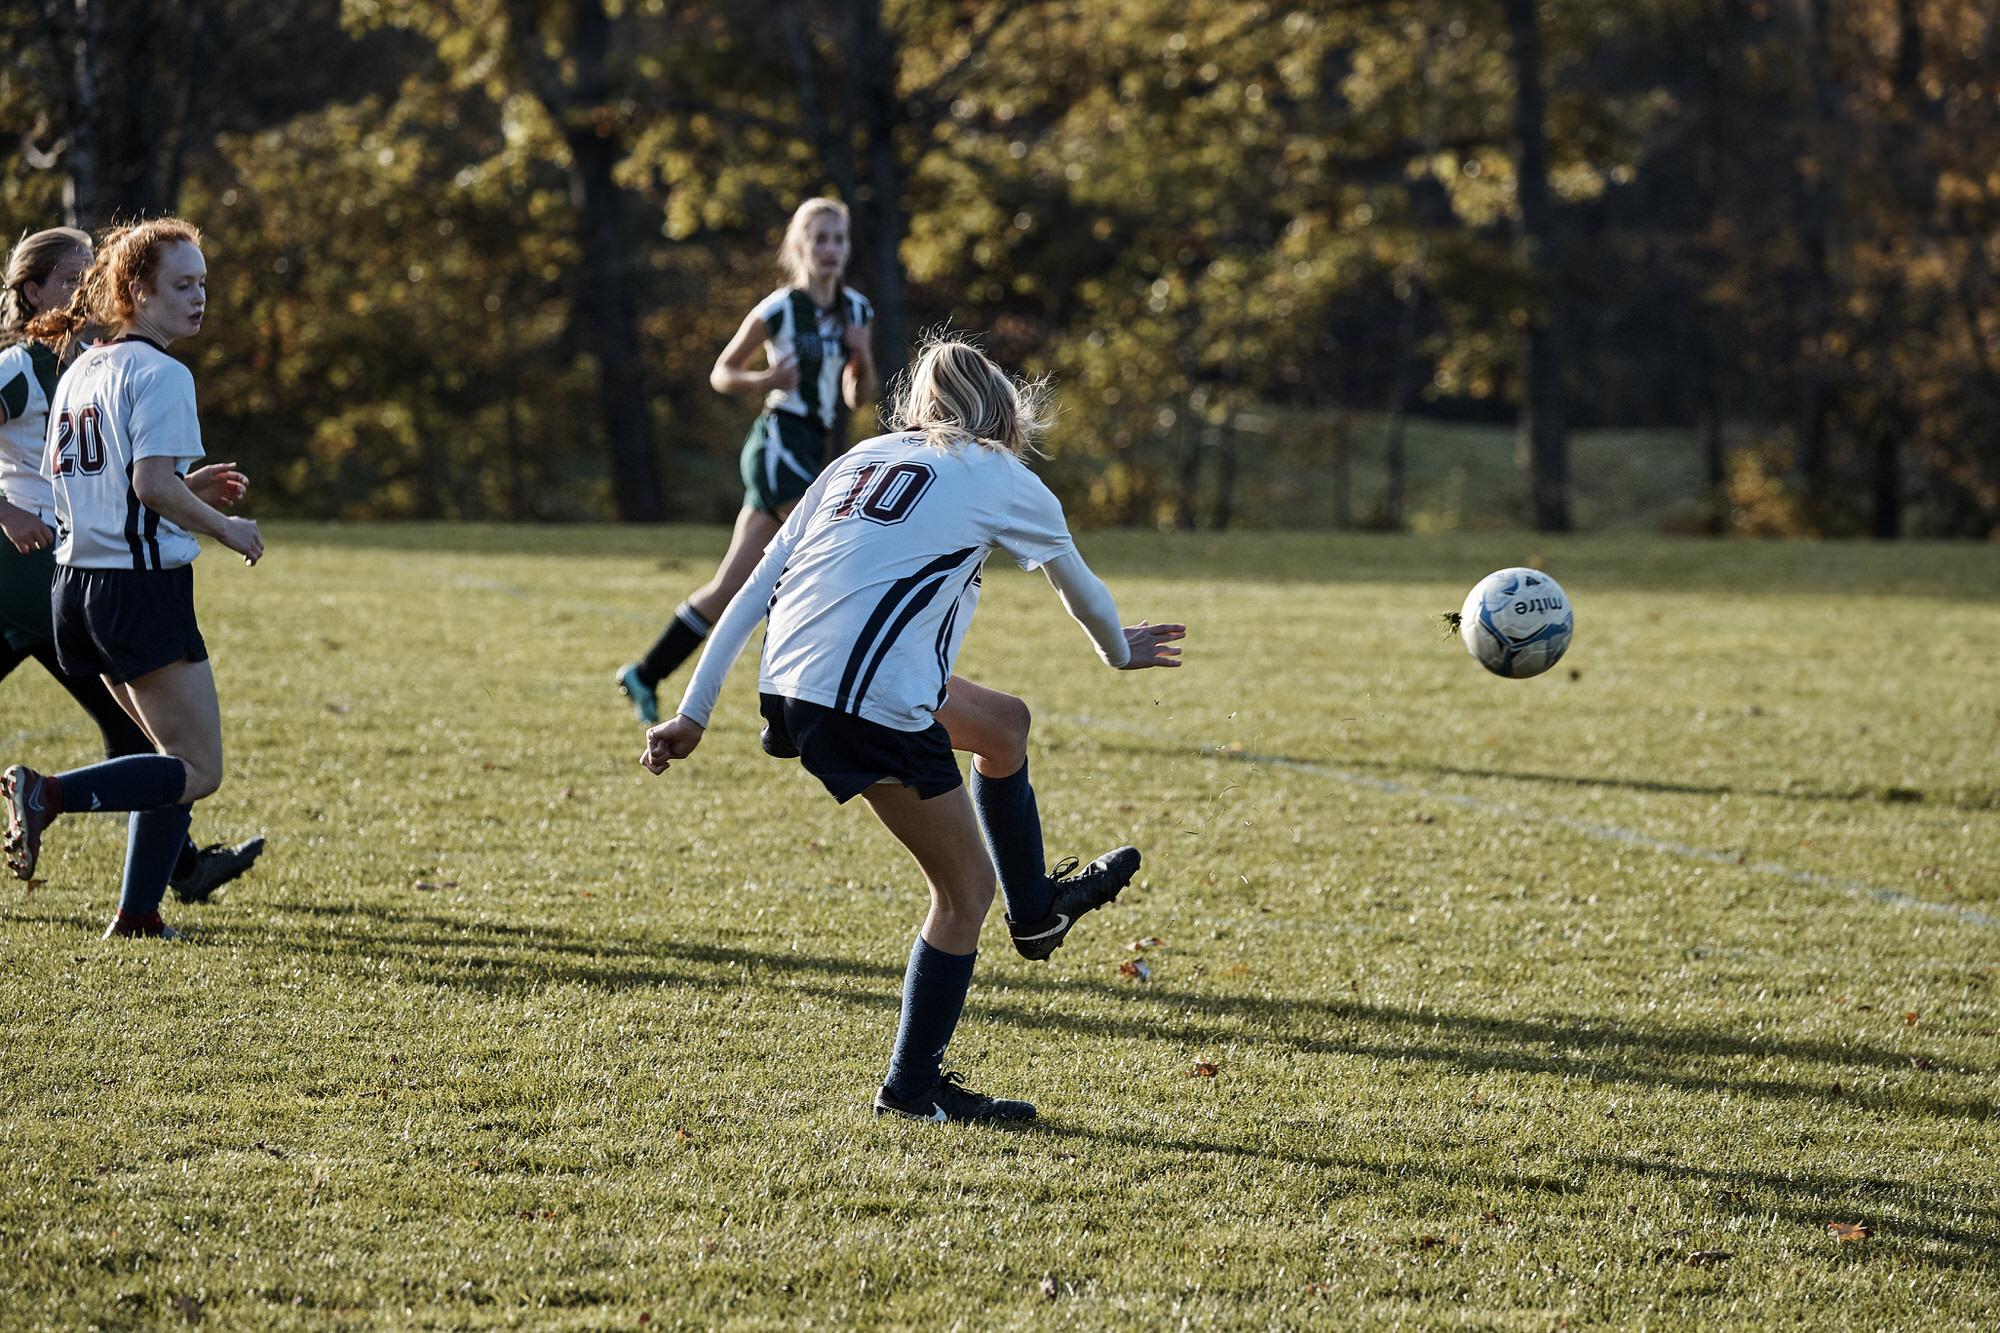 Girls Varsity Soccer vs. Putney School - October 26, 2018 - 035.jpg